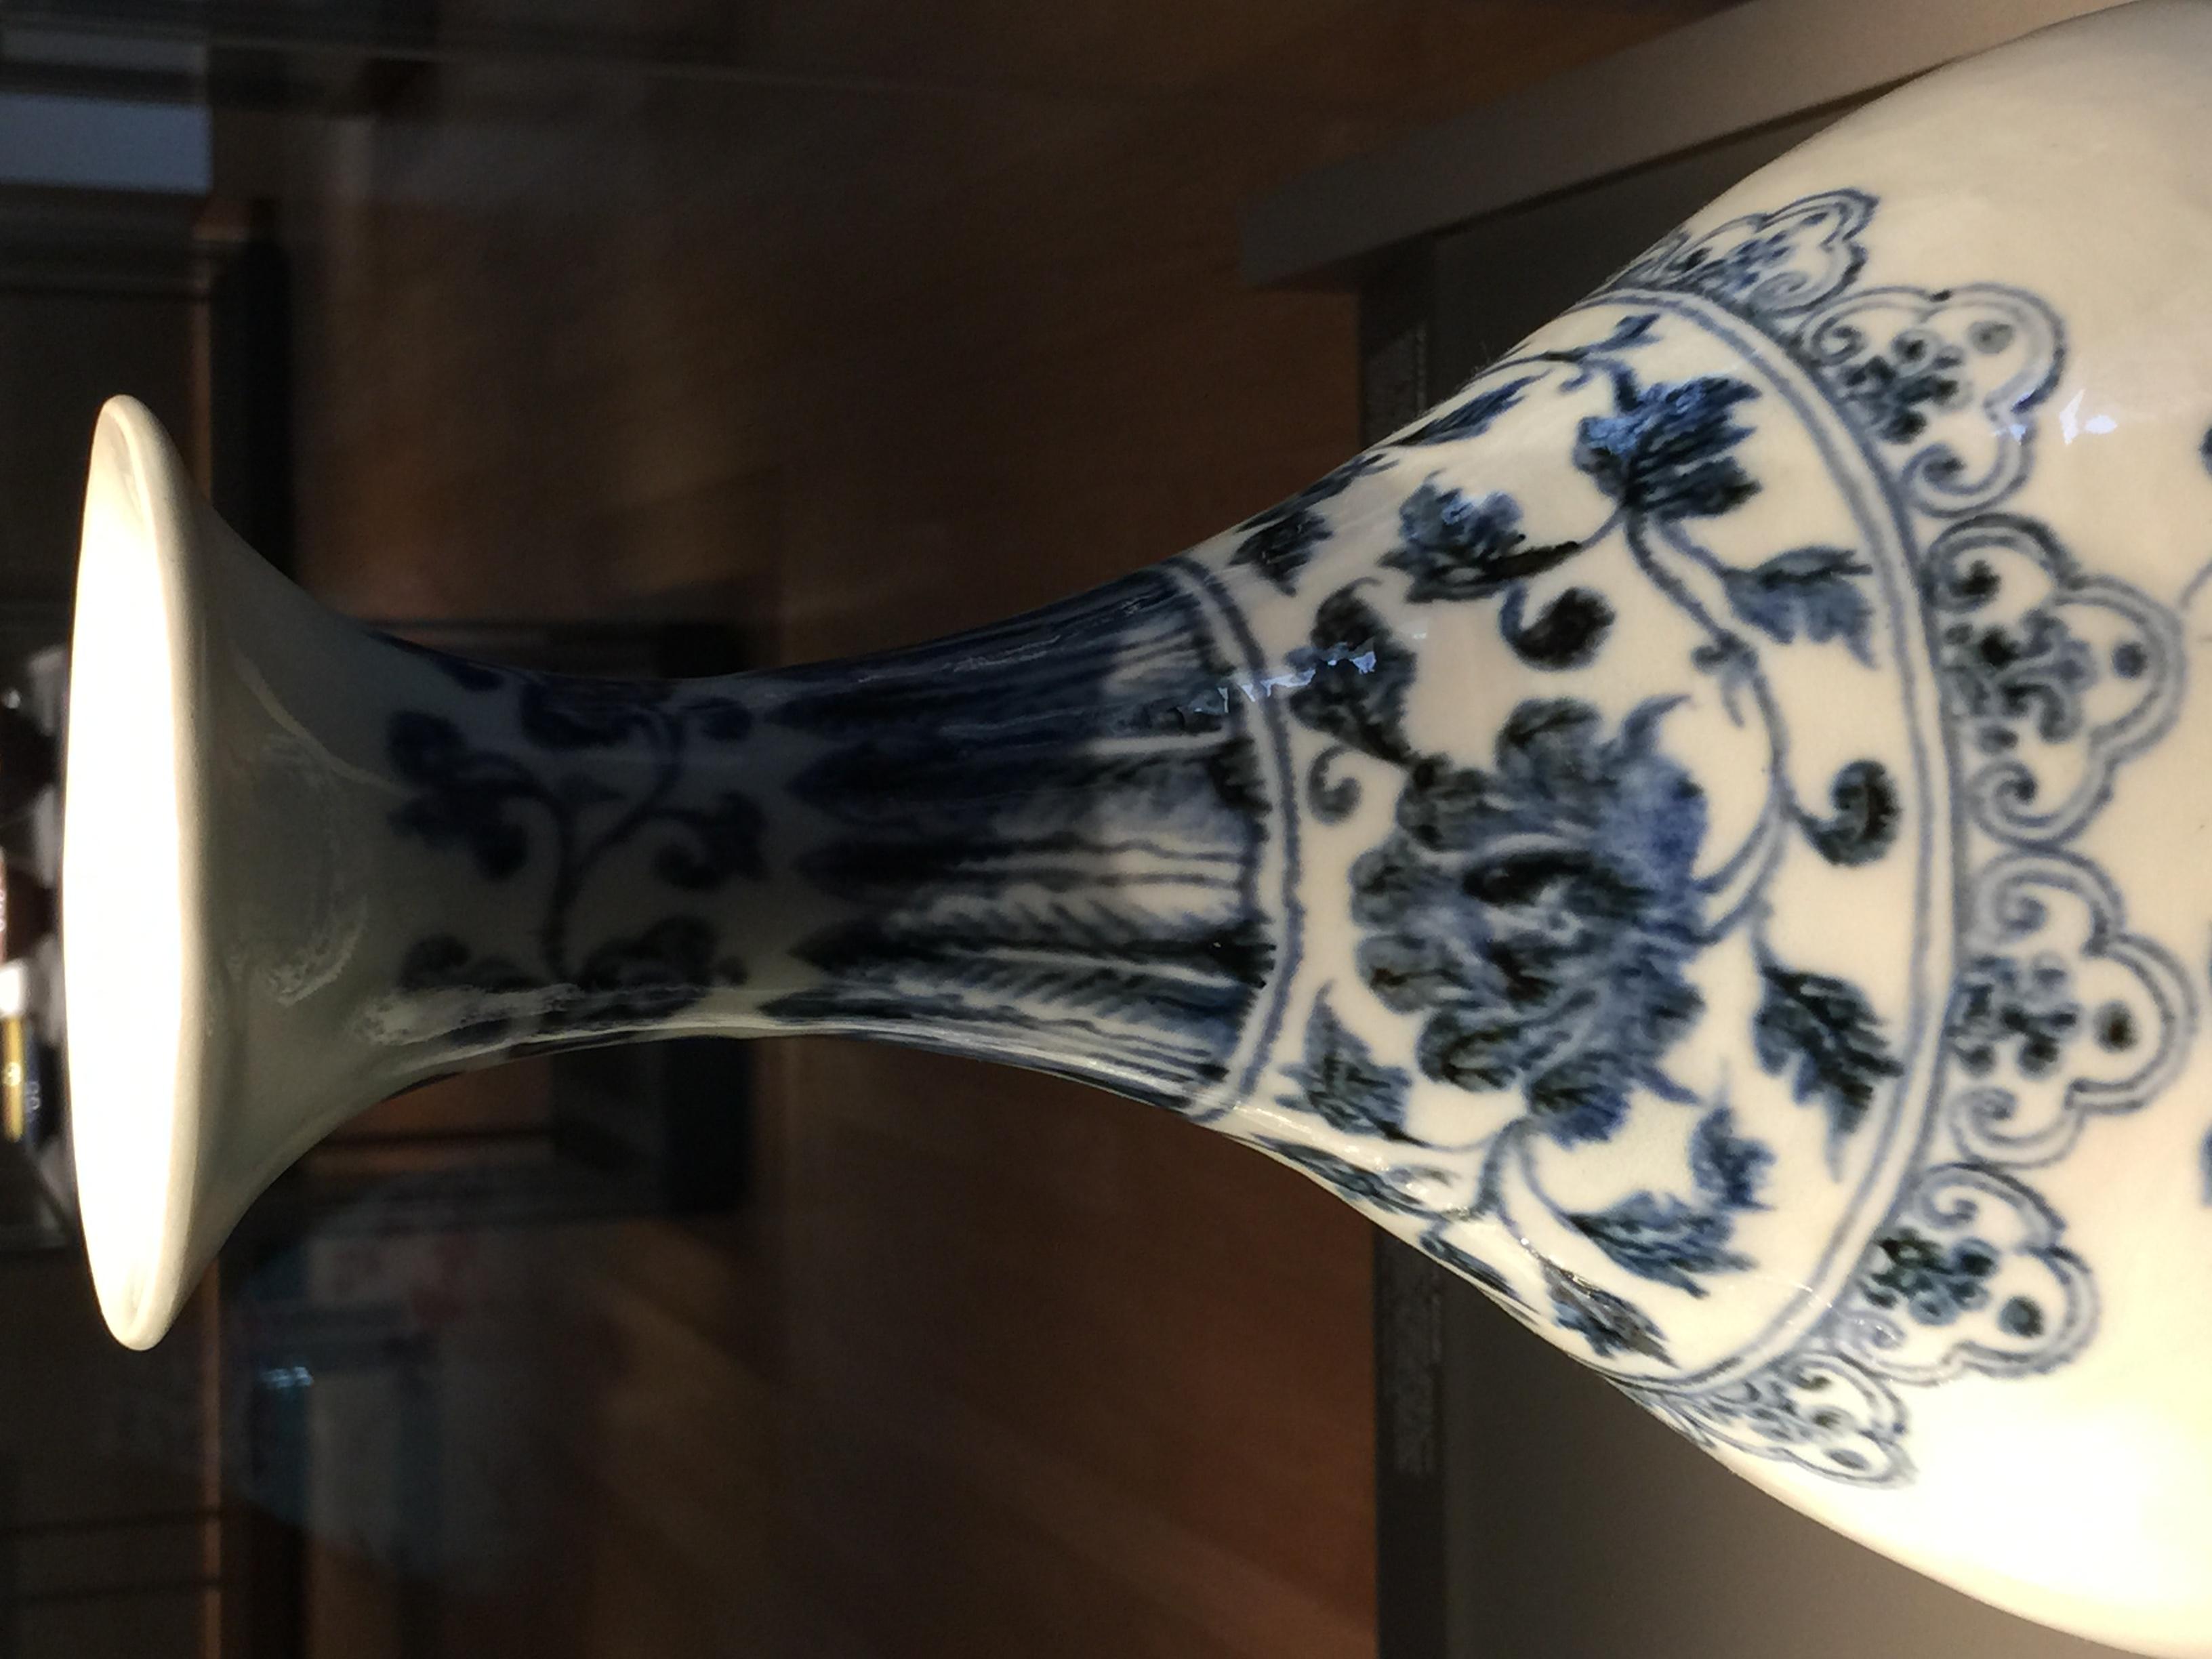 Chinese-Porcelain-British-Museum-Percival-David-jessewaugh.com-37.jpg